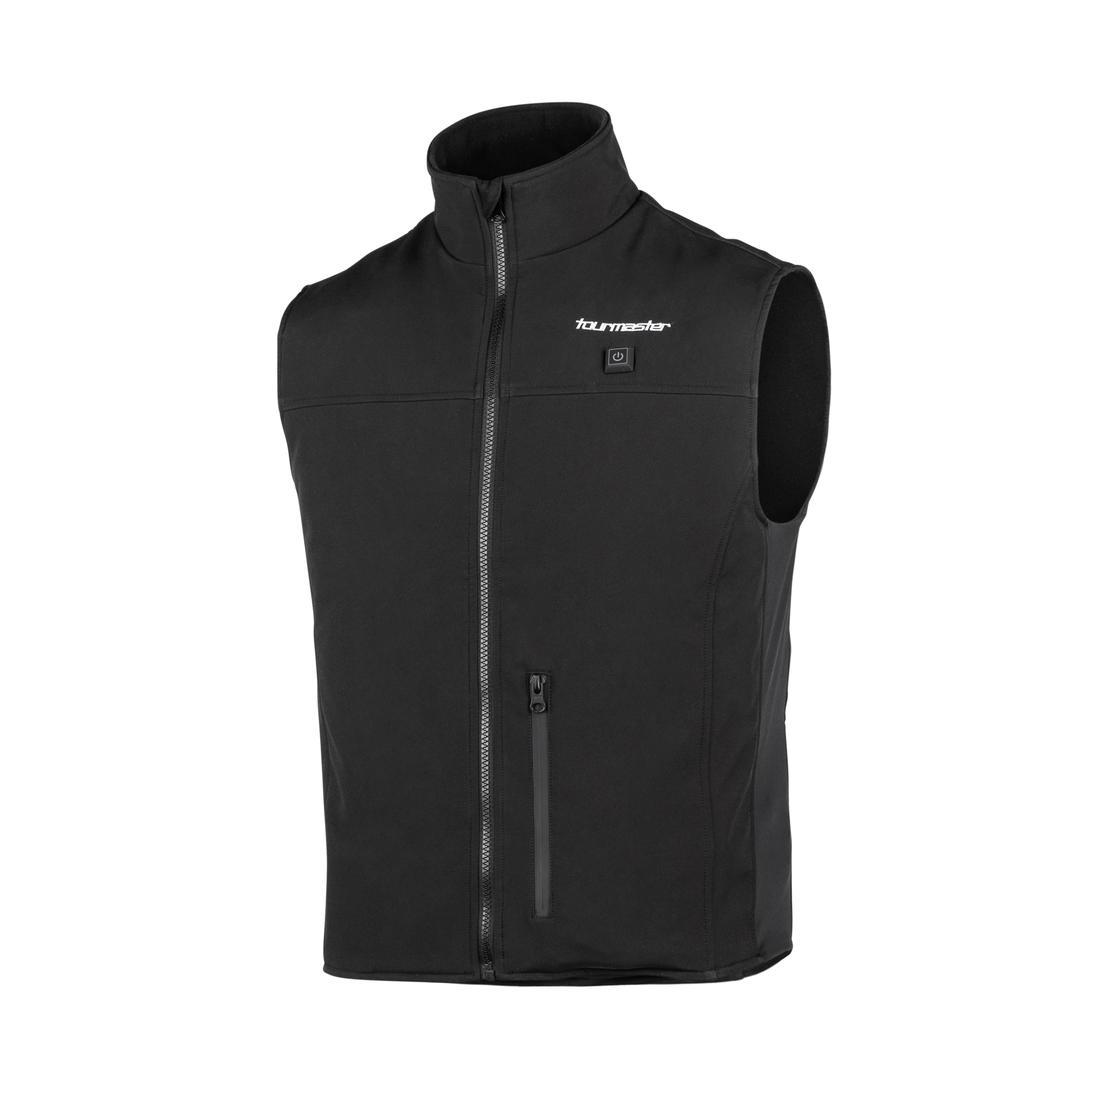 Tourmaster Synergy Mens Black Pro-Plus 12-Volt Heated Motorcycle Jacket